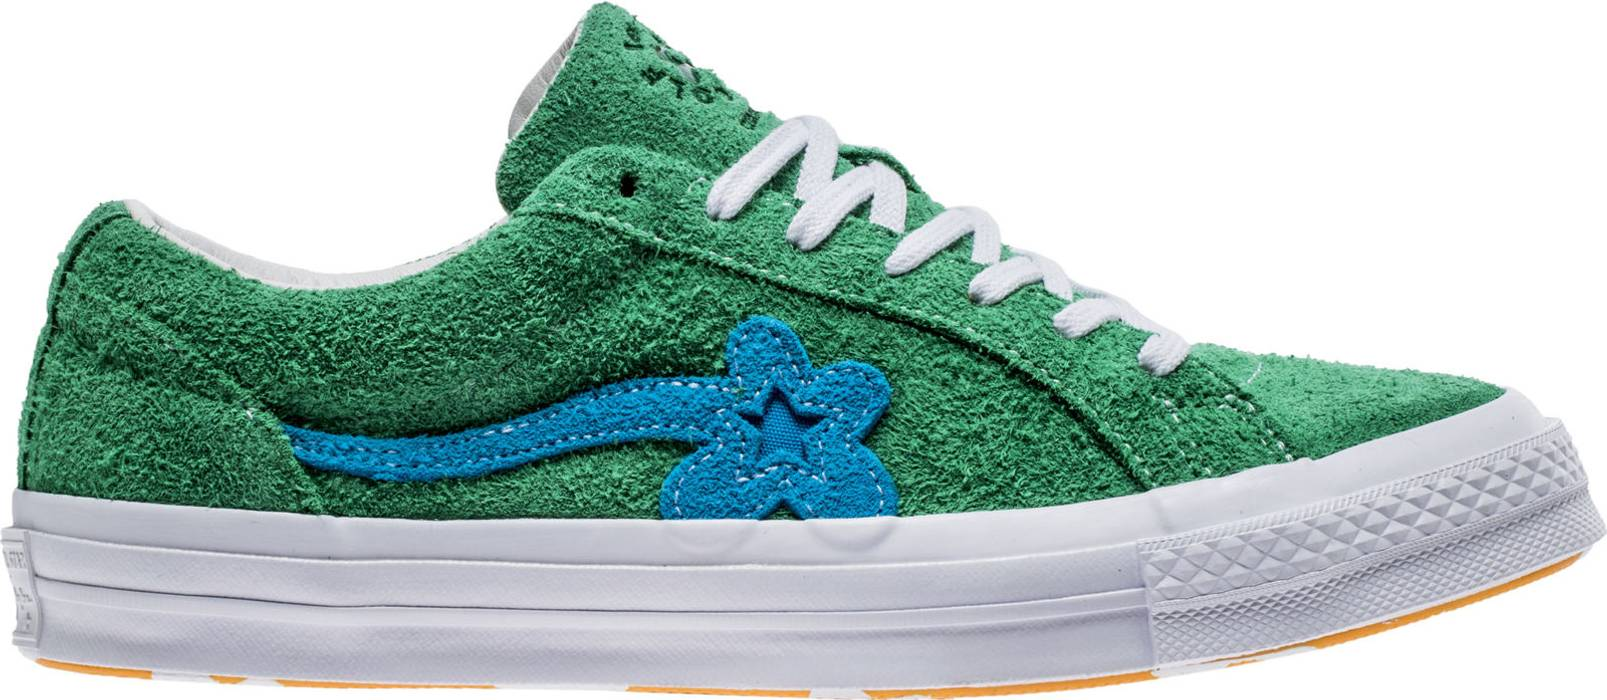 Converse Tyler The Creator X Converse Golf Le Fleur Green Blue Sz 11